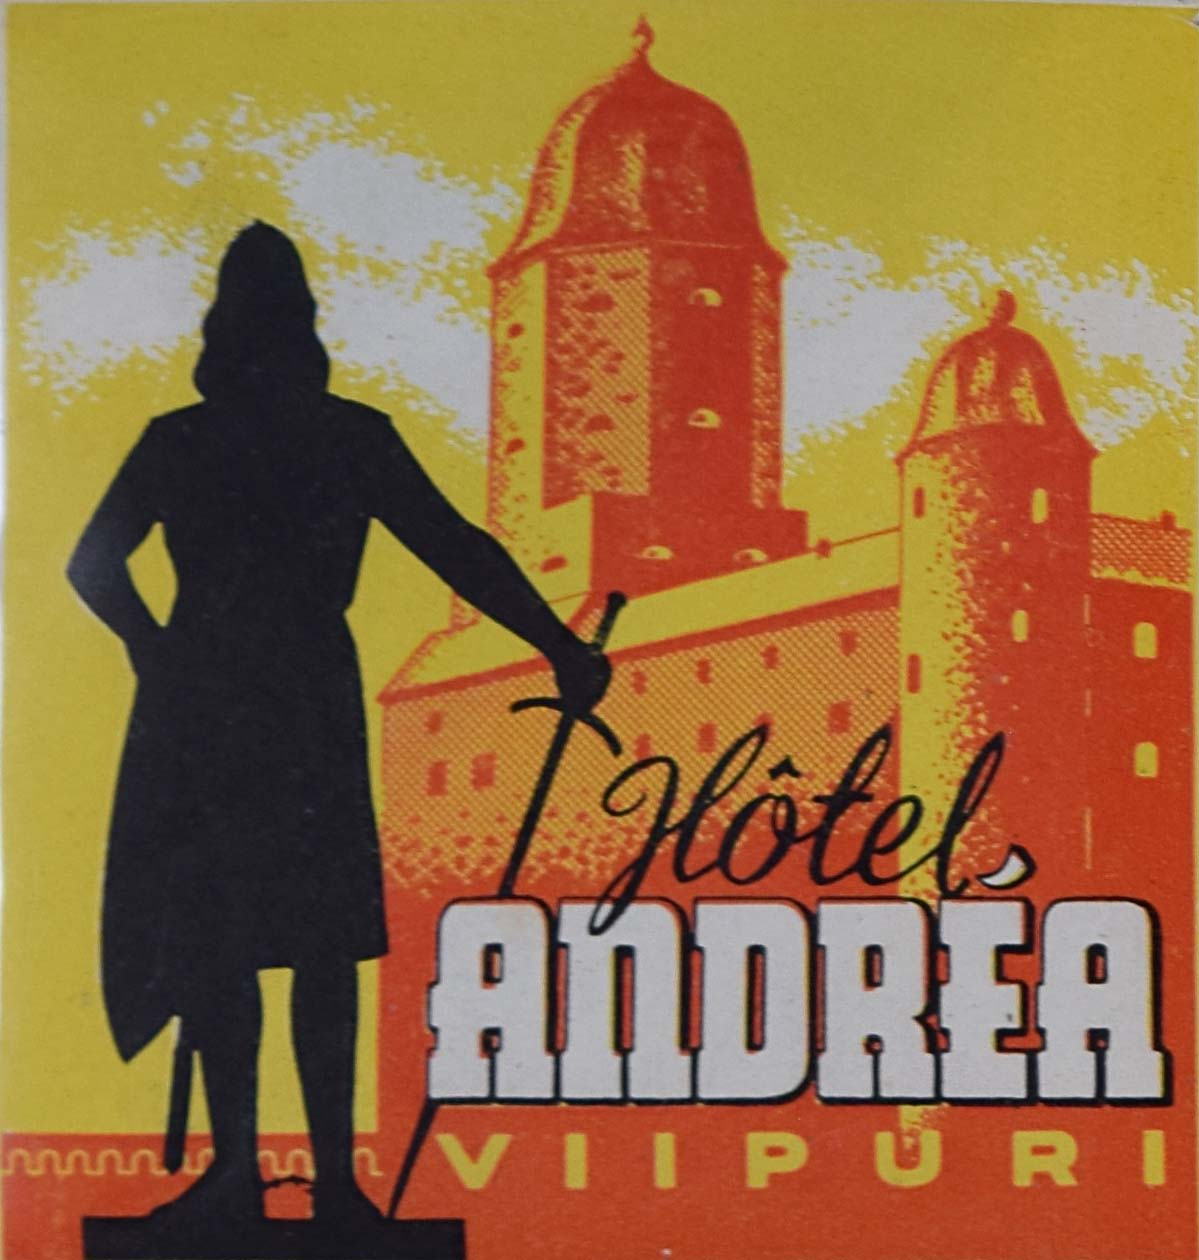 Hotel Andréa Viipuri Original Vintage Luggage Label